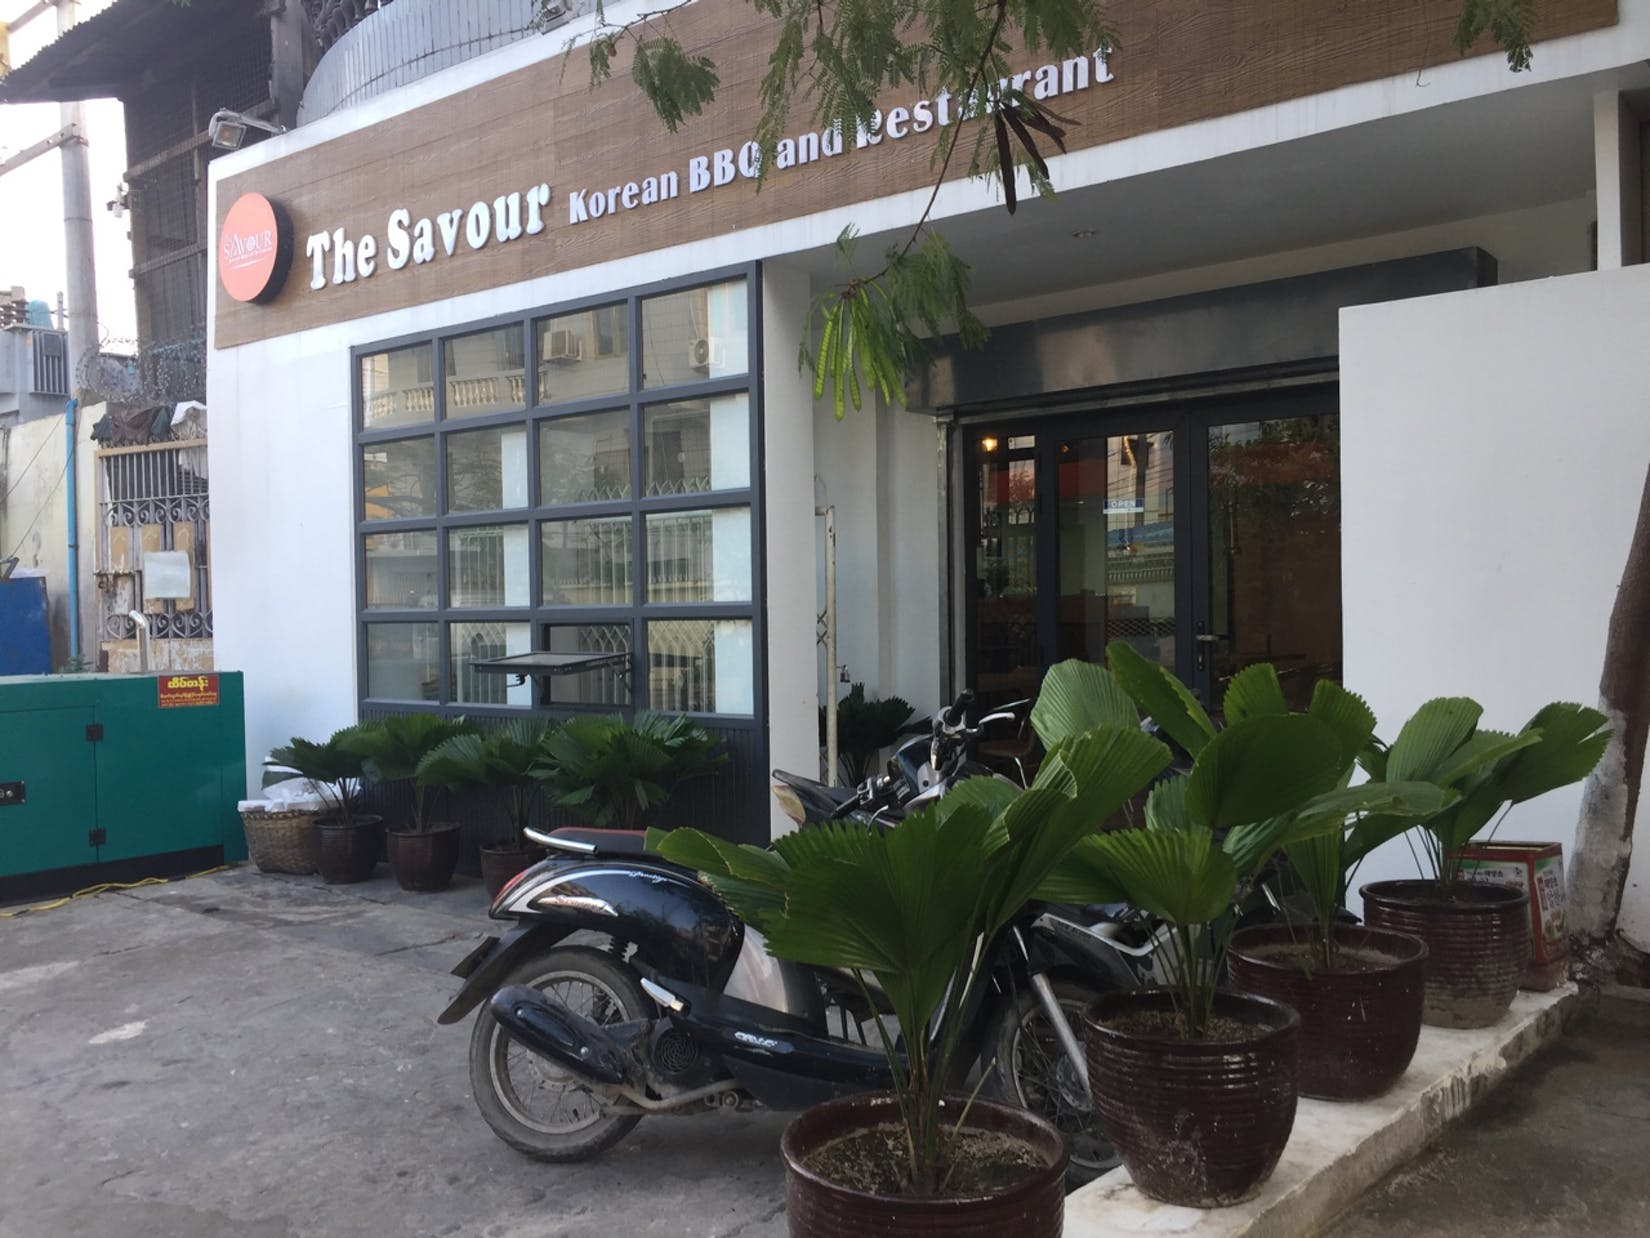 The Savour Korean Bbq&Restaurant | yathar